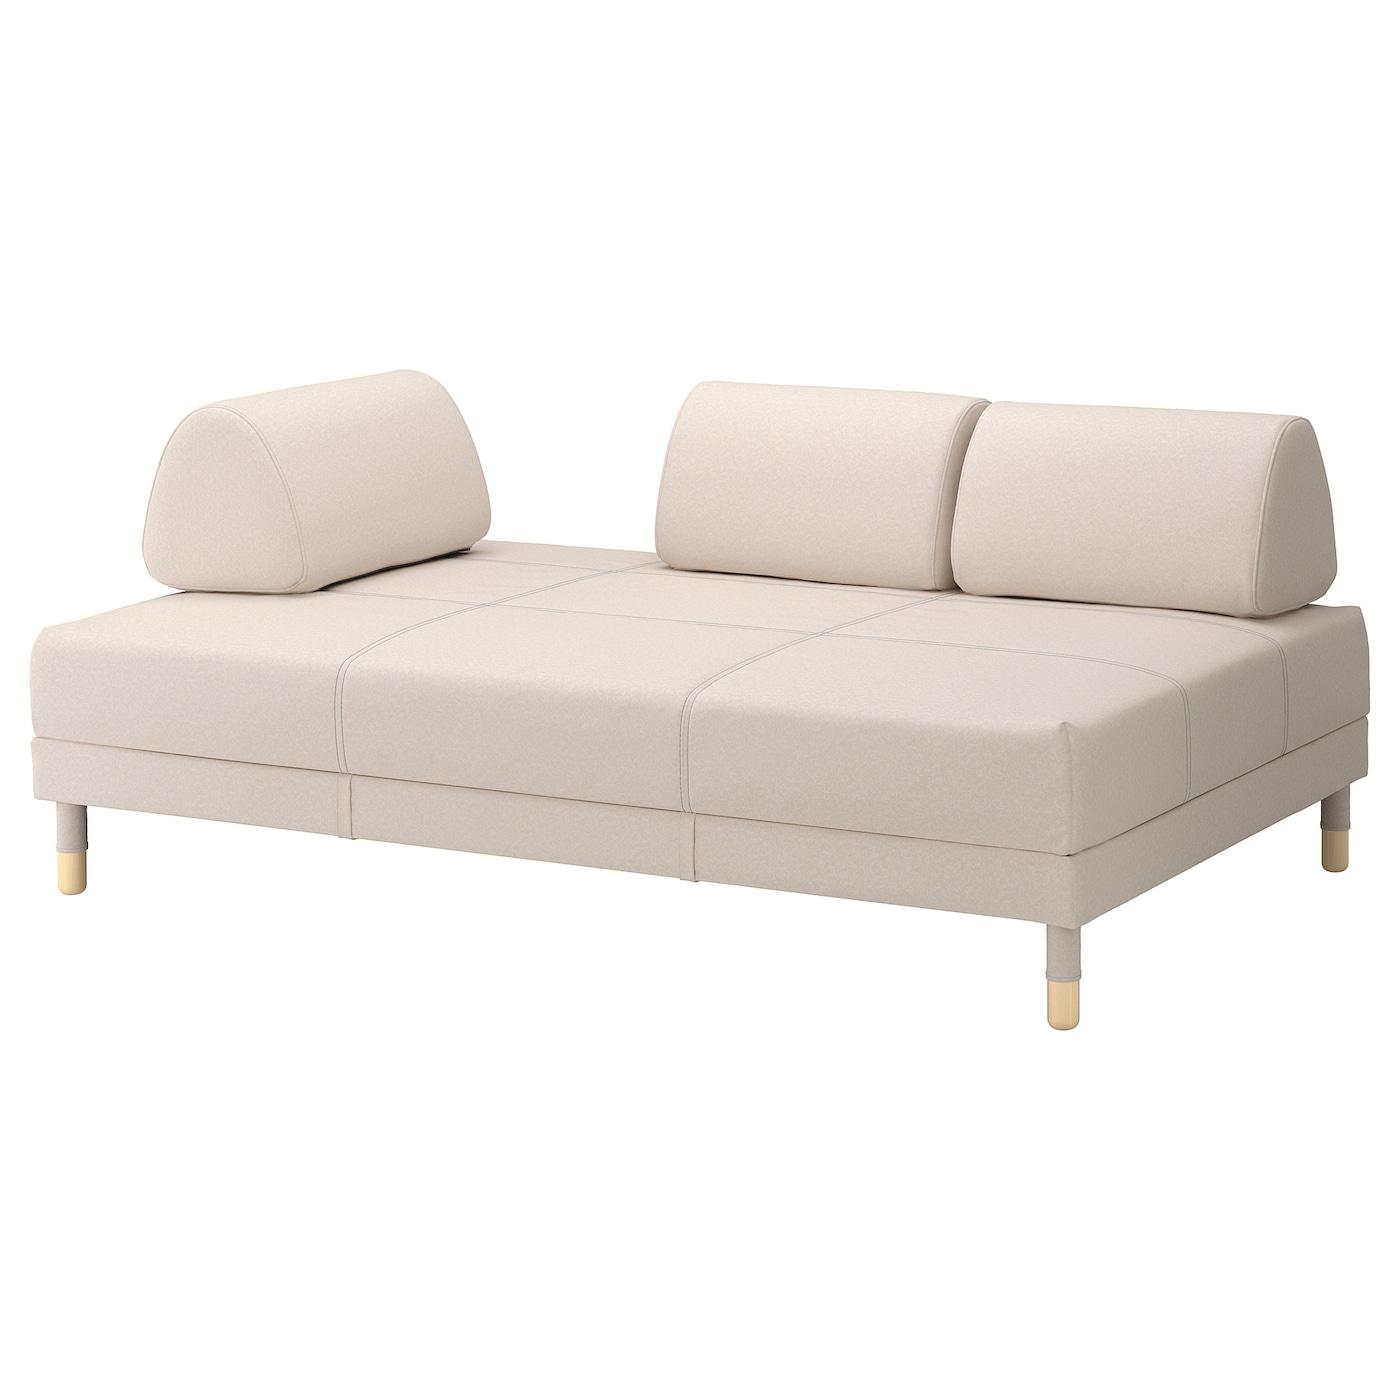 Slaapbank 120 Cm.Flottebo Slaapbank Lofallet Beige 120 Cm Ikea